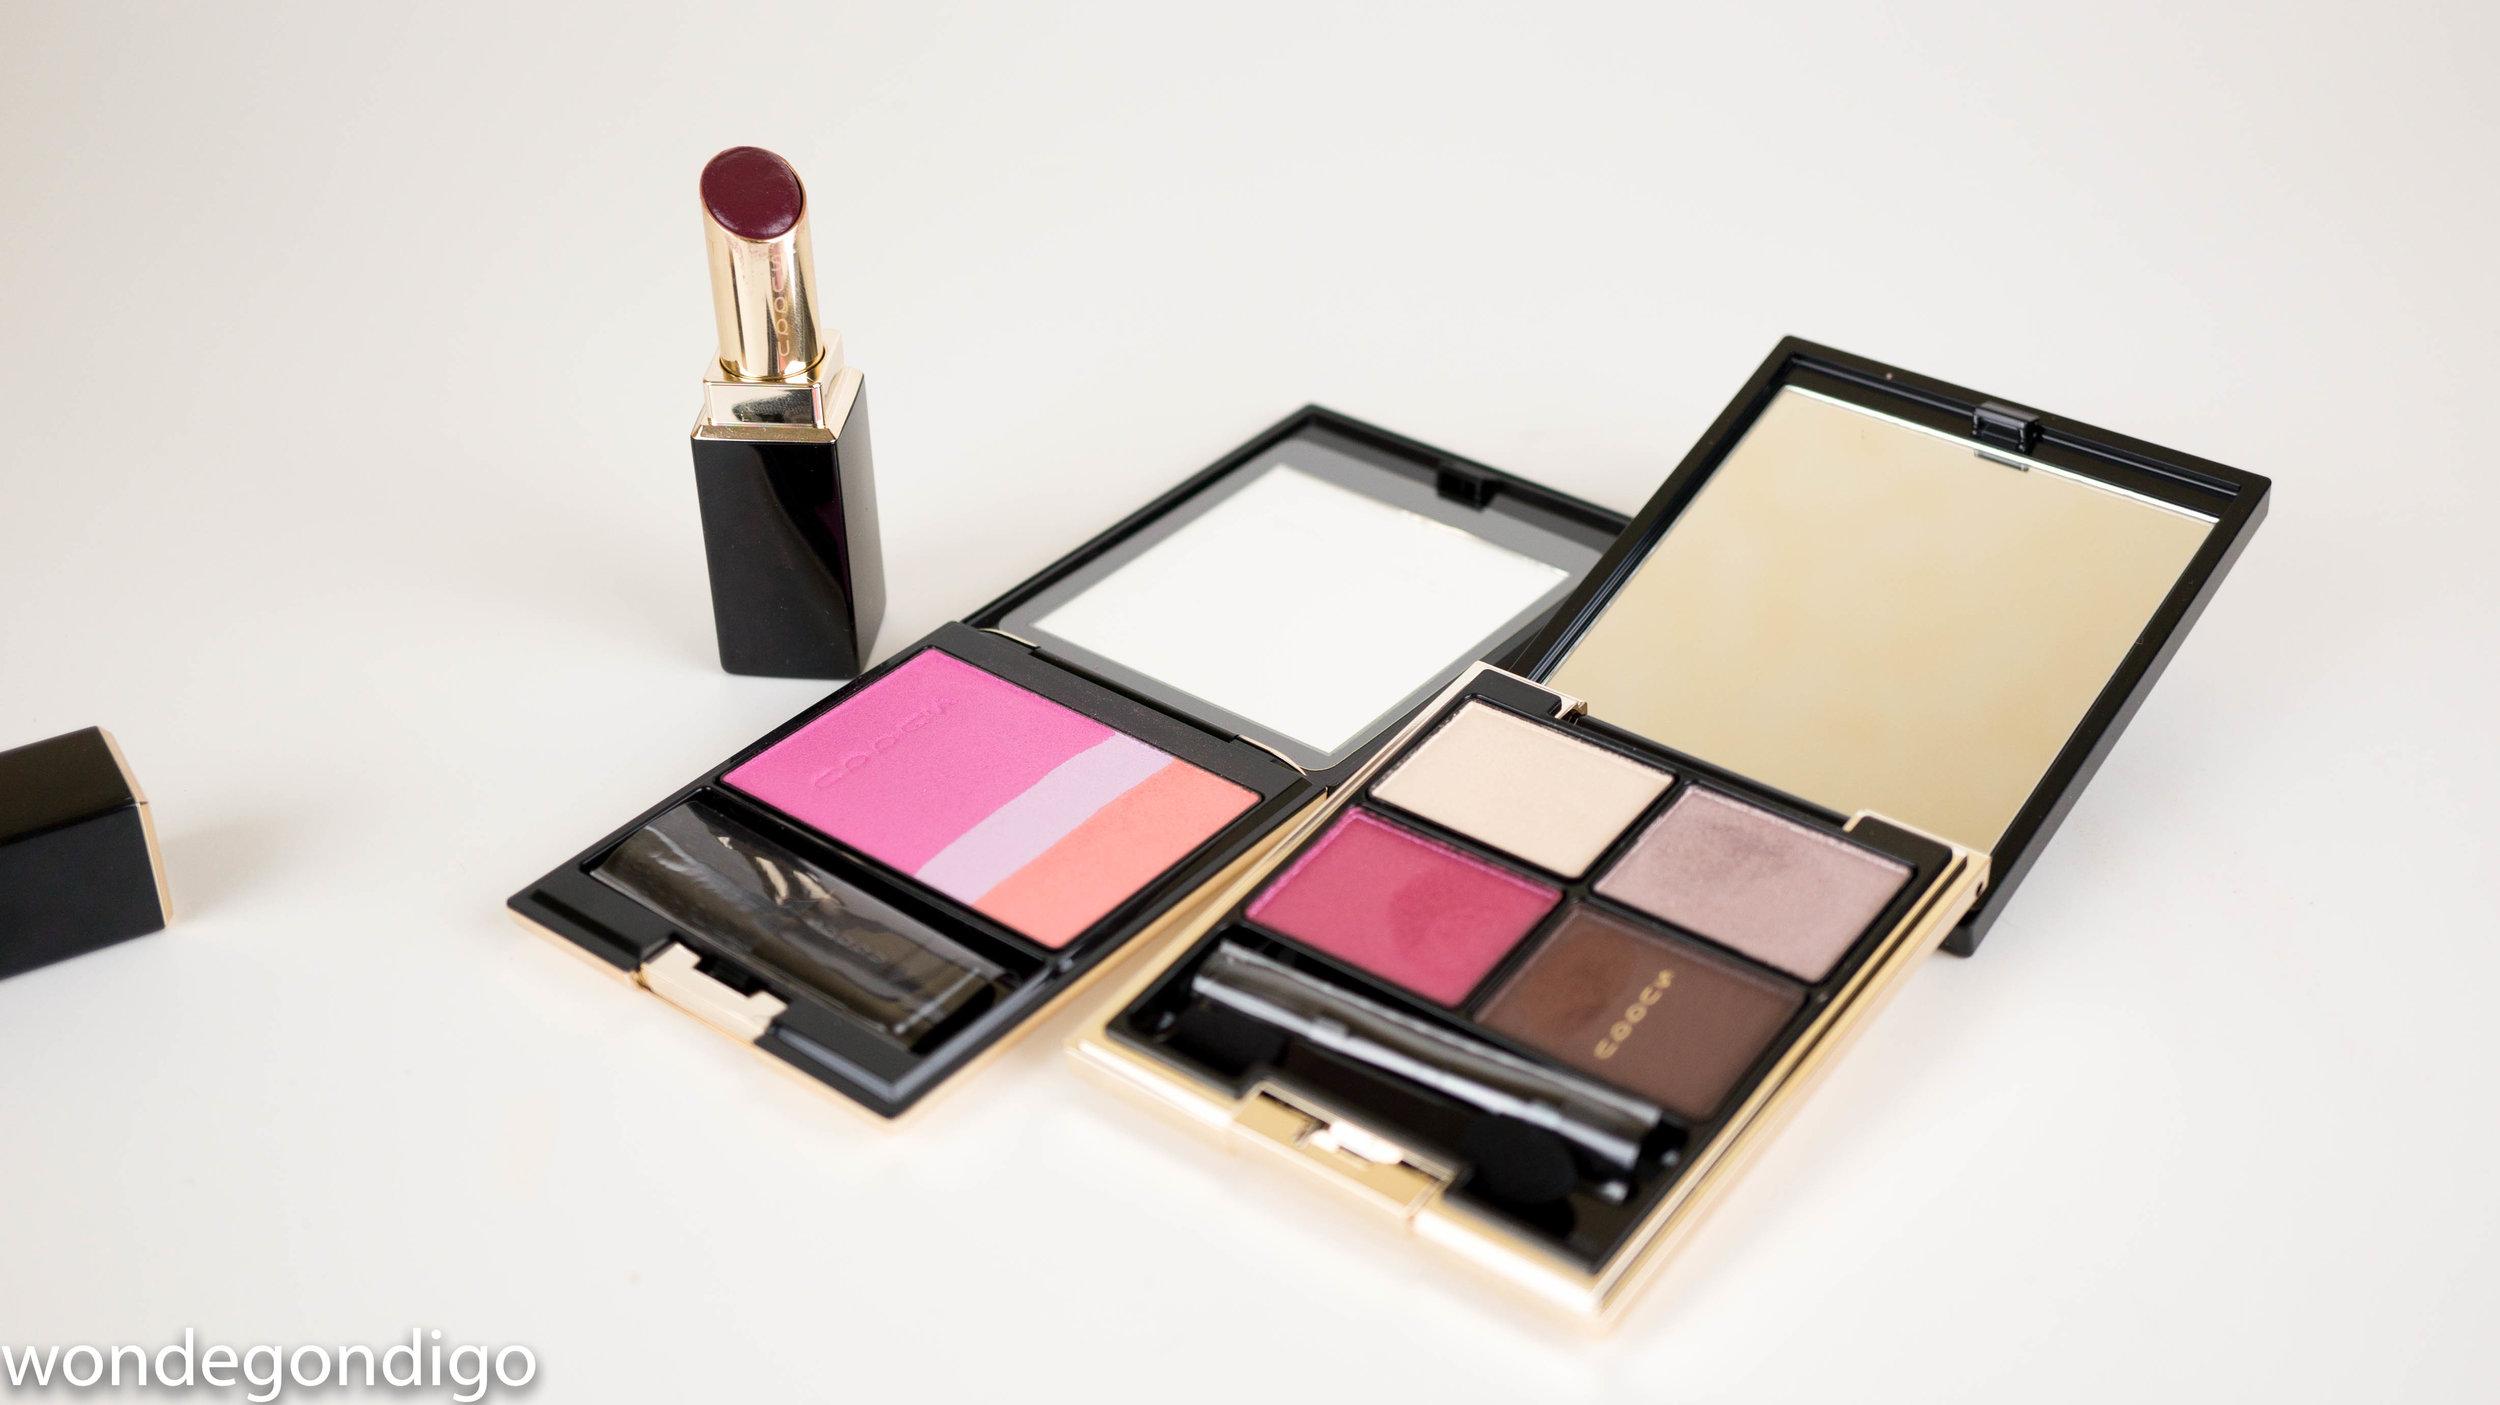 Designing Color Eyes 06 Yoibeni (pr sample), Pure Color Blush 104 Benizuki, Moisture Rich Lipstick 101 Ichijiku